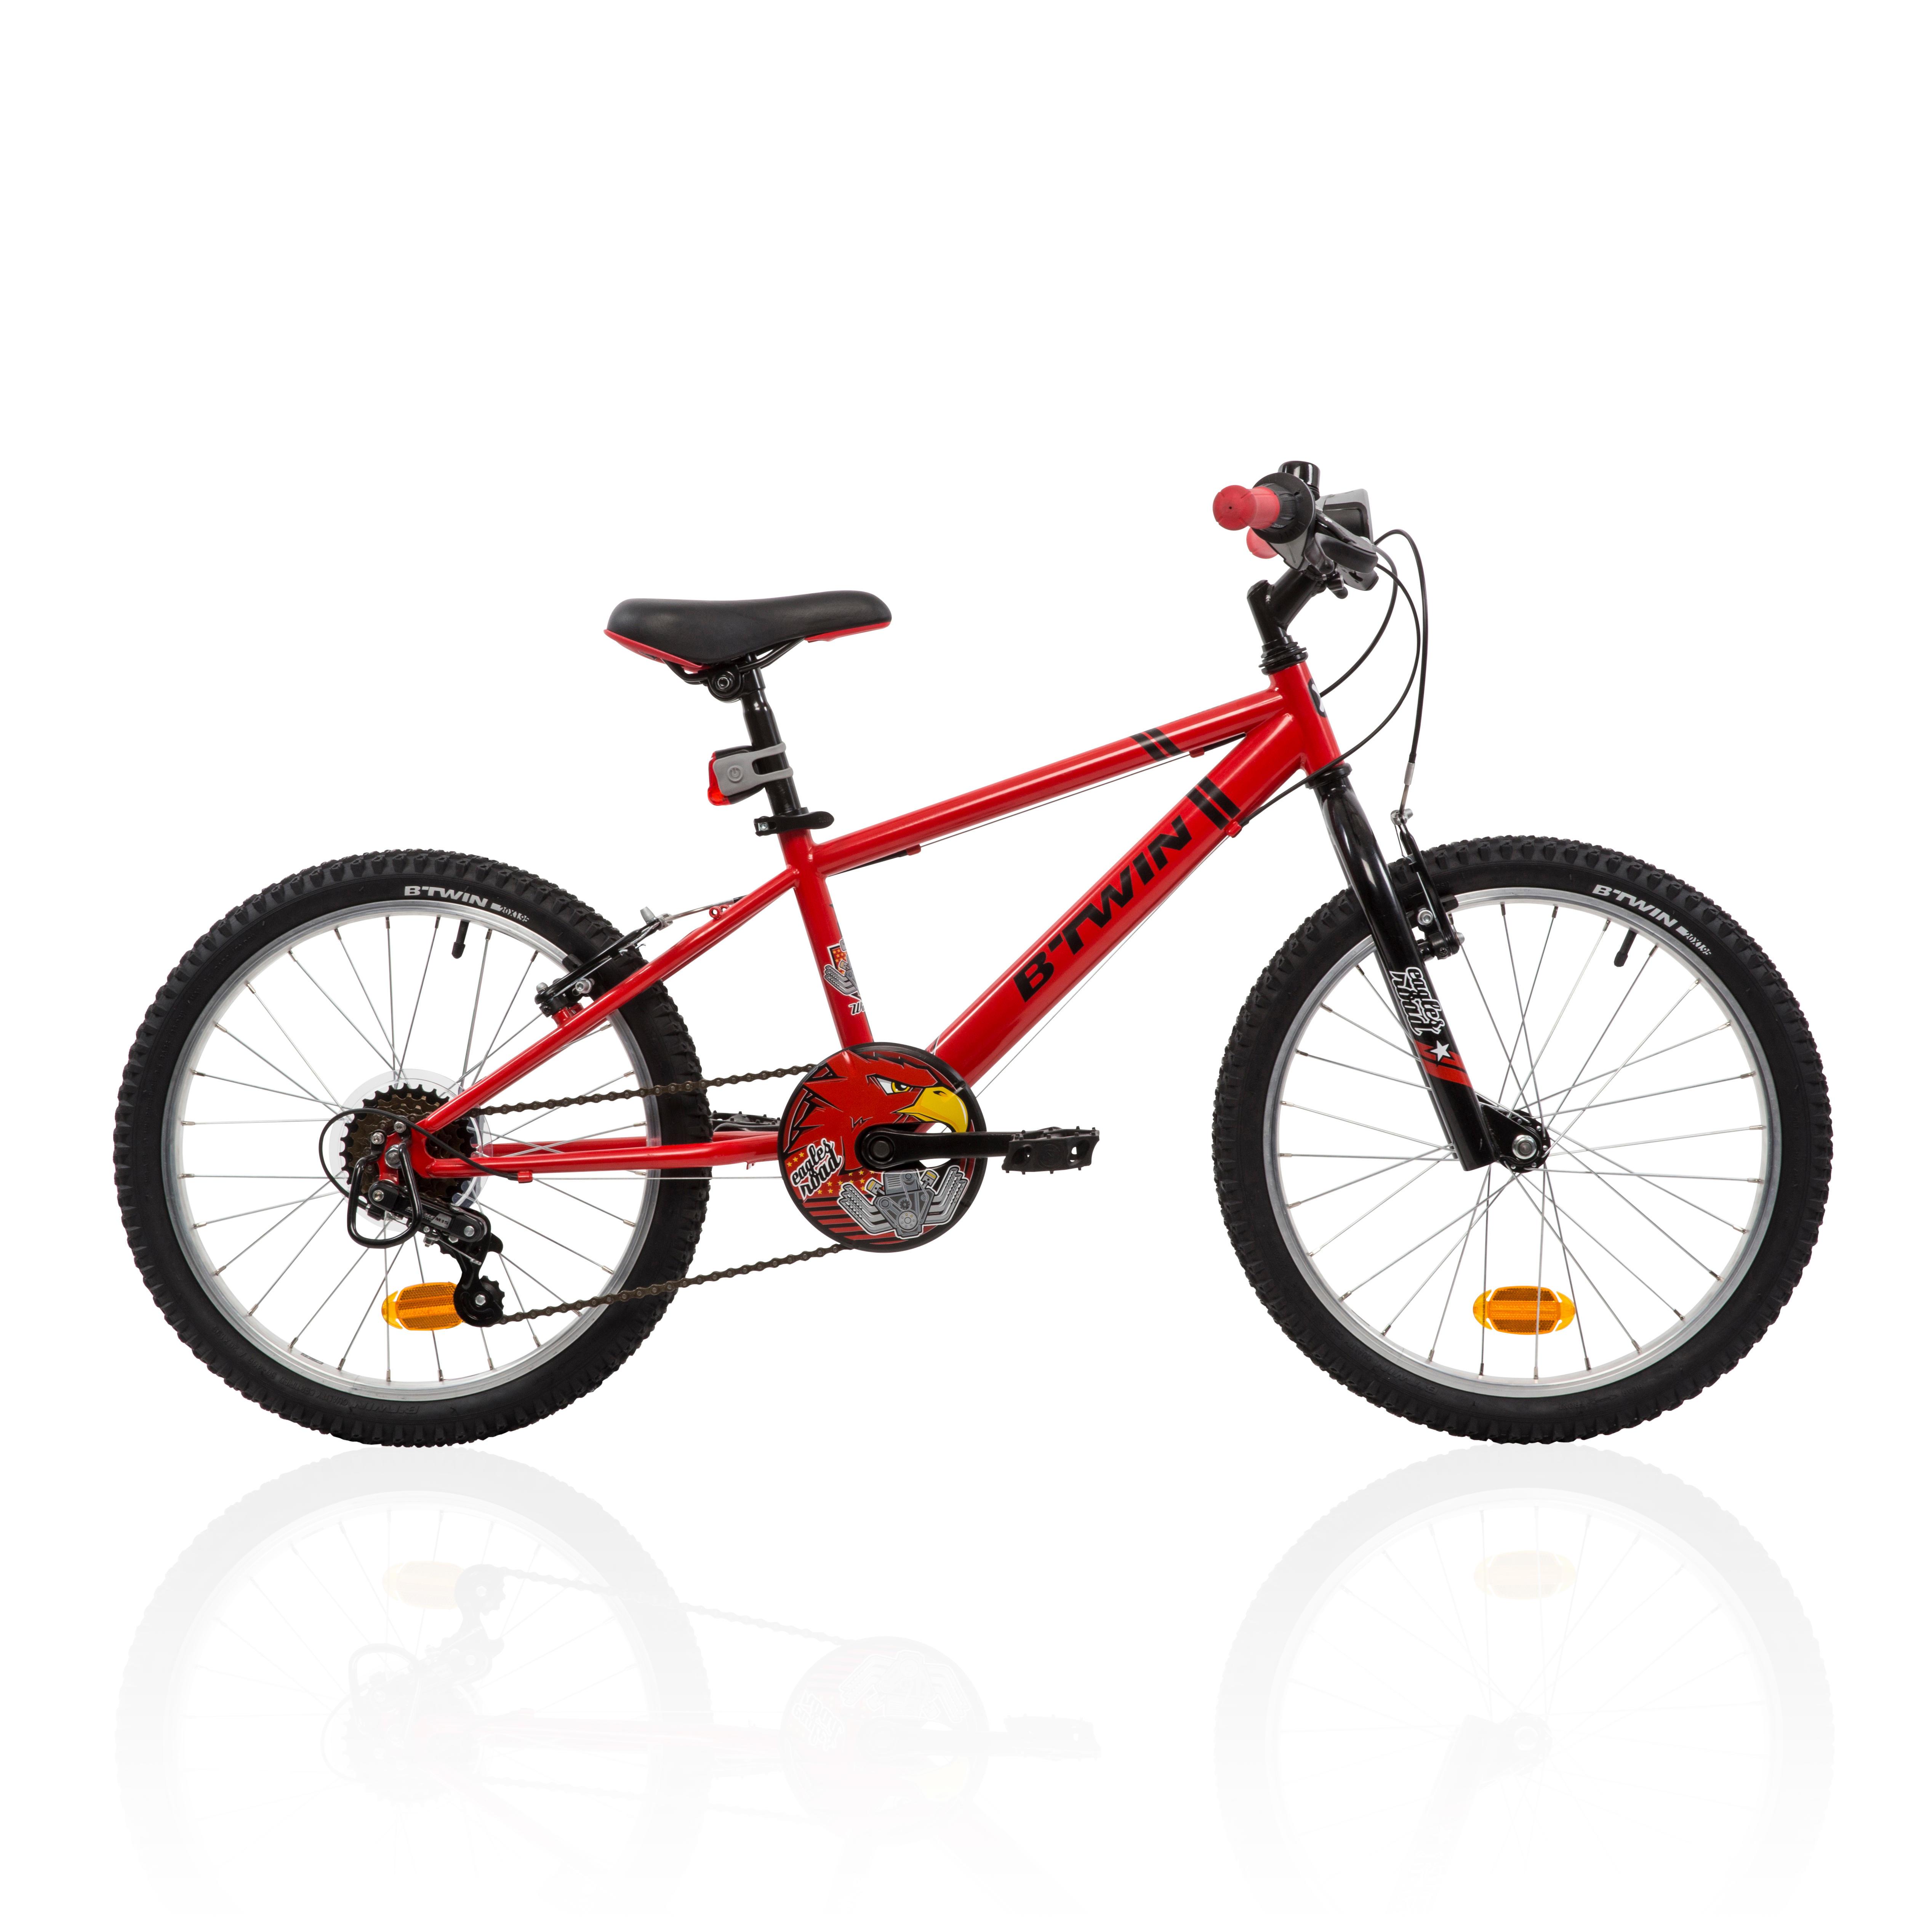 Racing Boy 320 20_QUOTE_ Children's Mountain Bike - Red